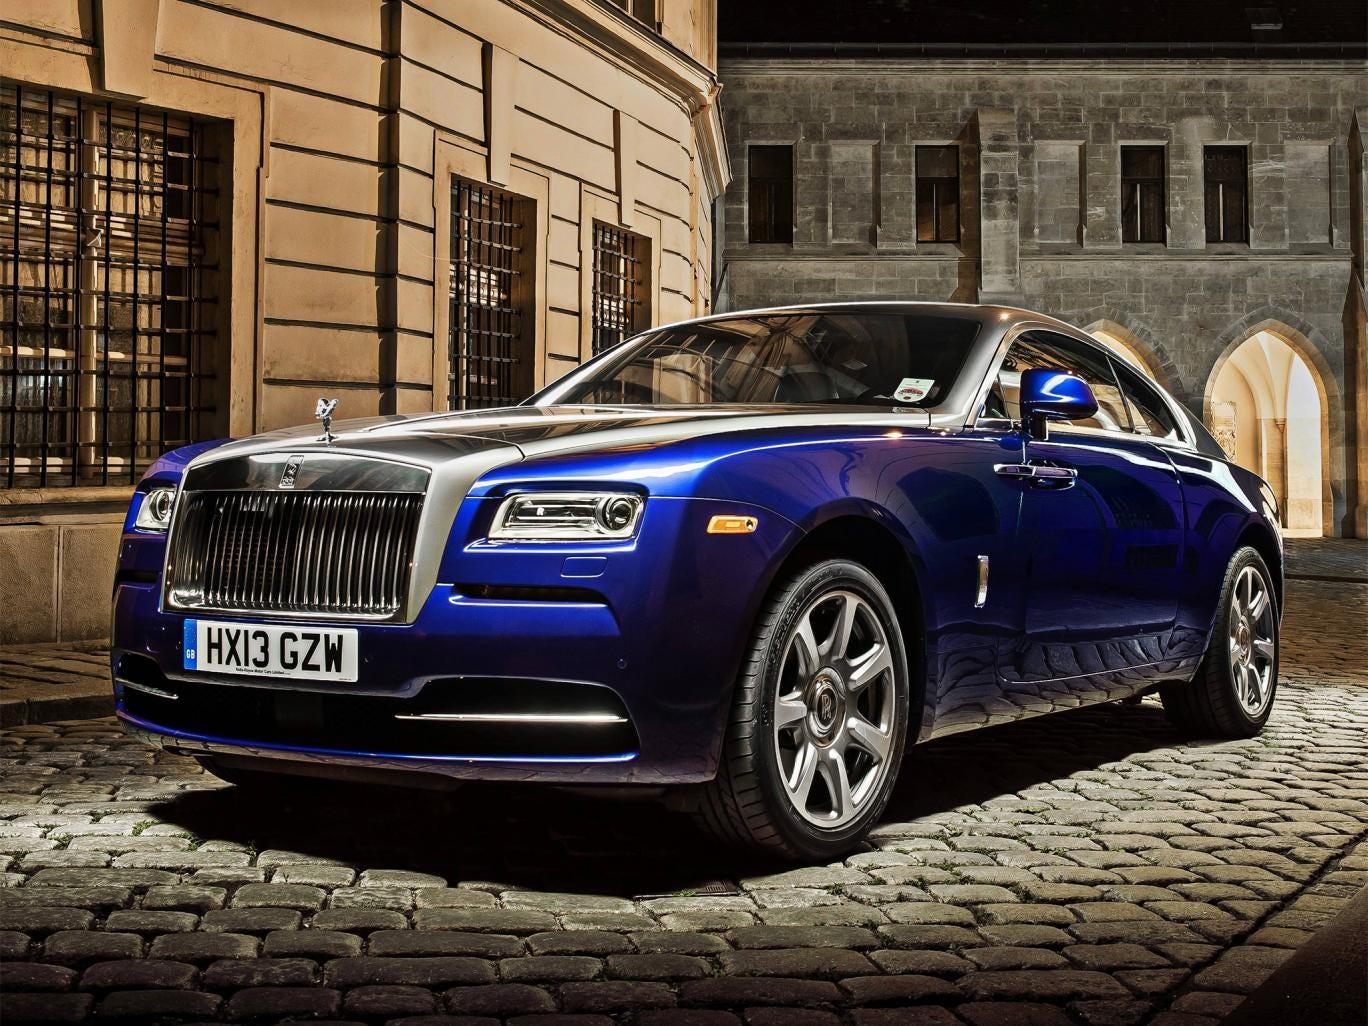 Luxurious hunk: the new Rolls-Royce Wraith